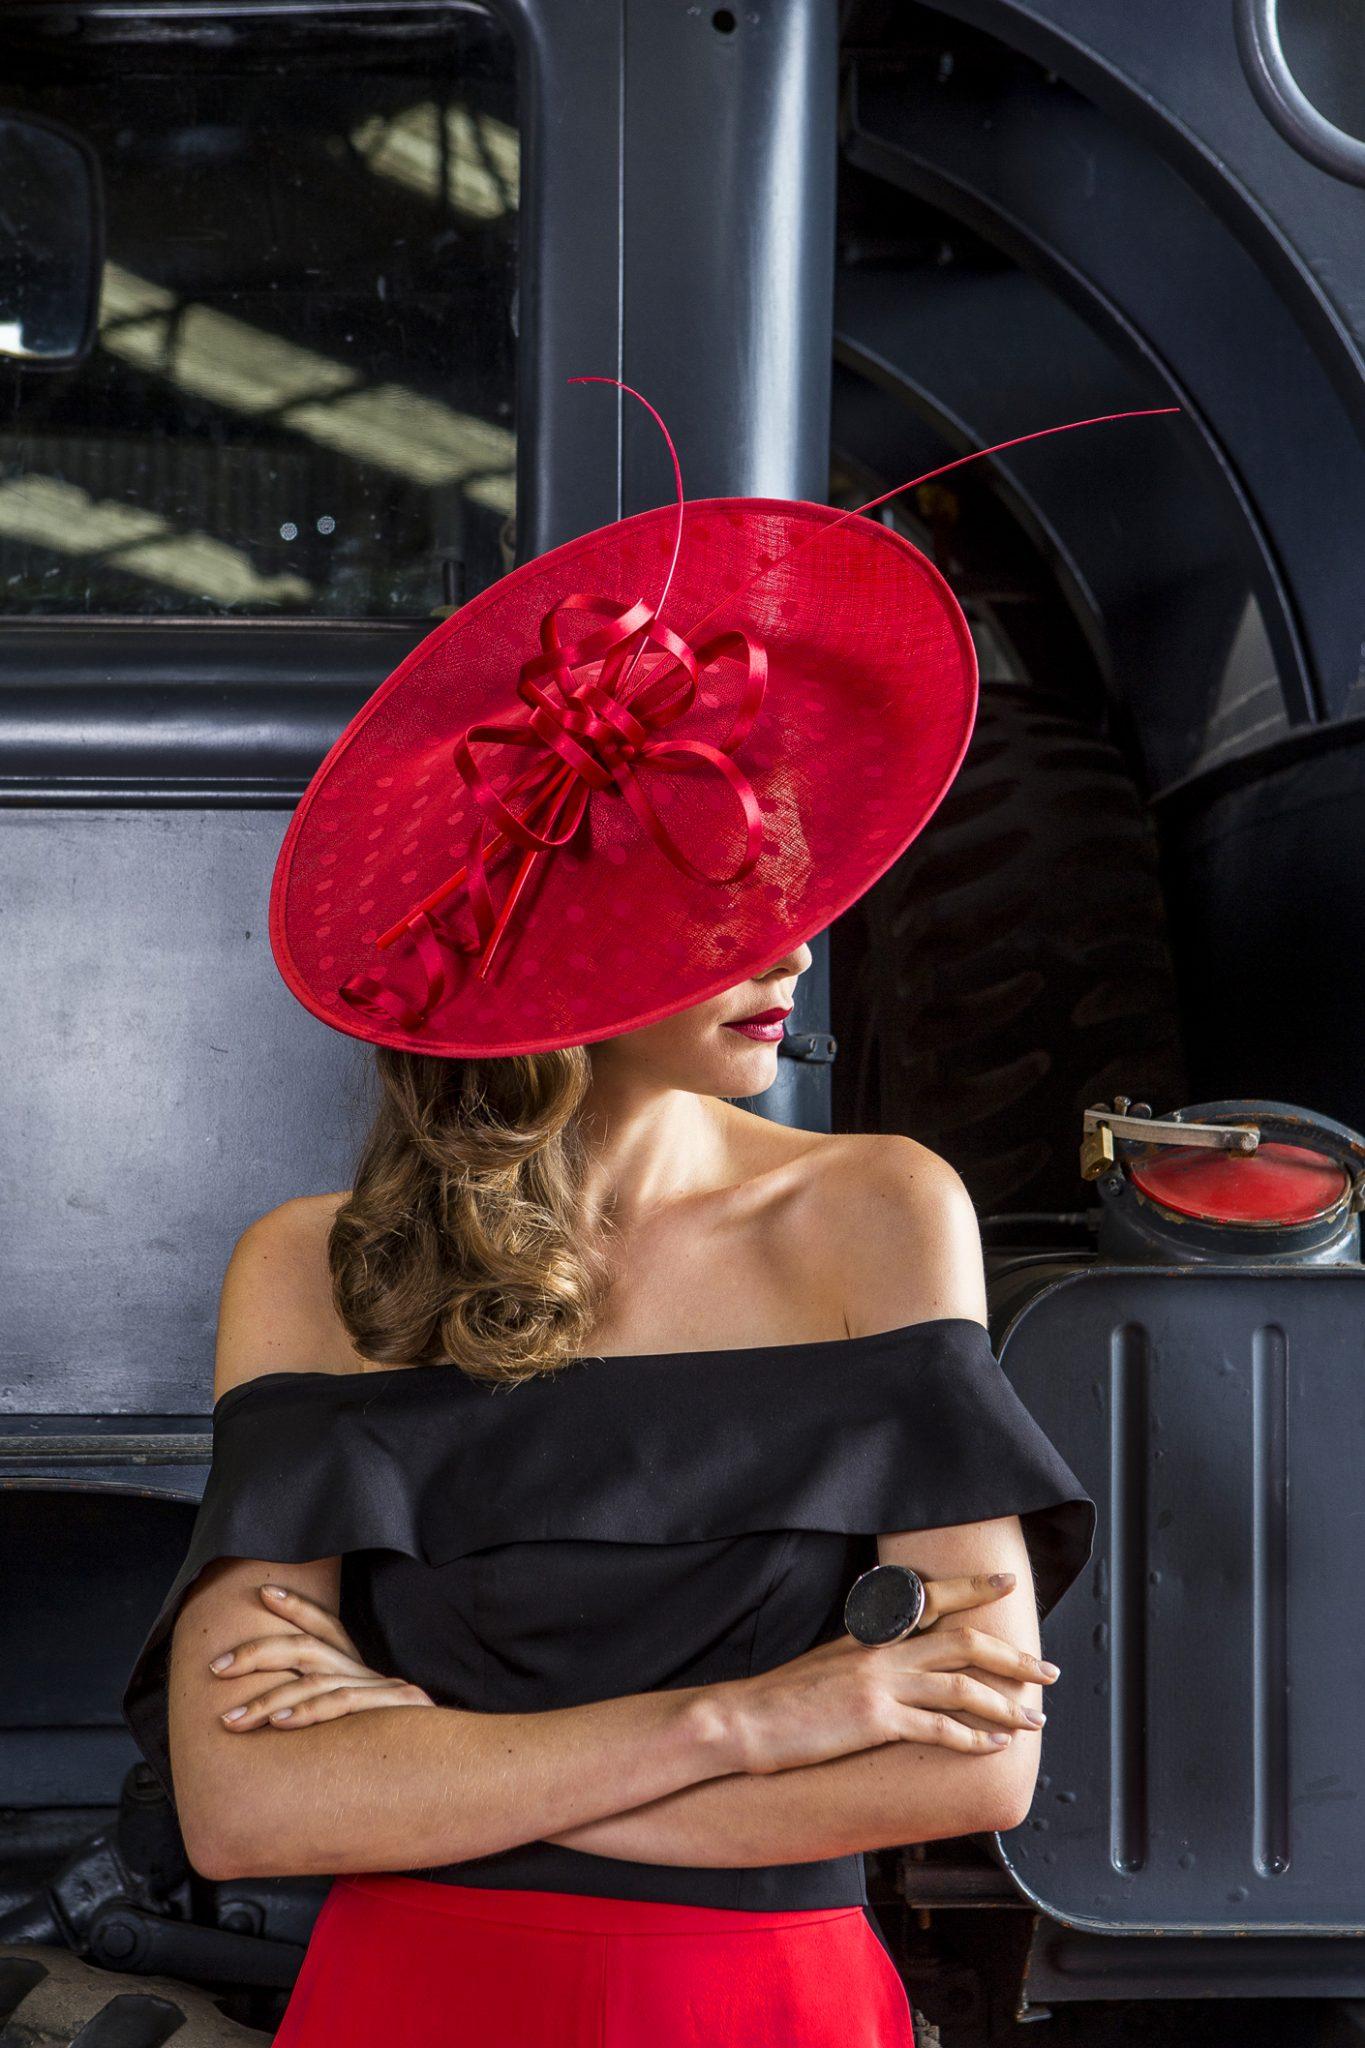 womeswear-apparel-fashion-photography-manchester